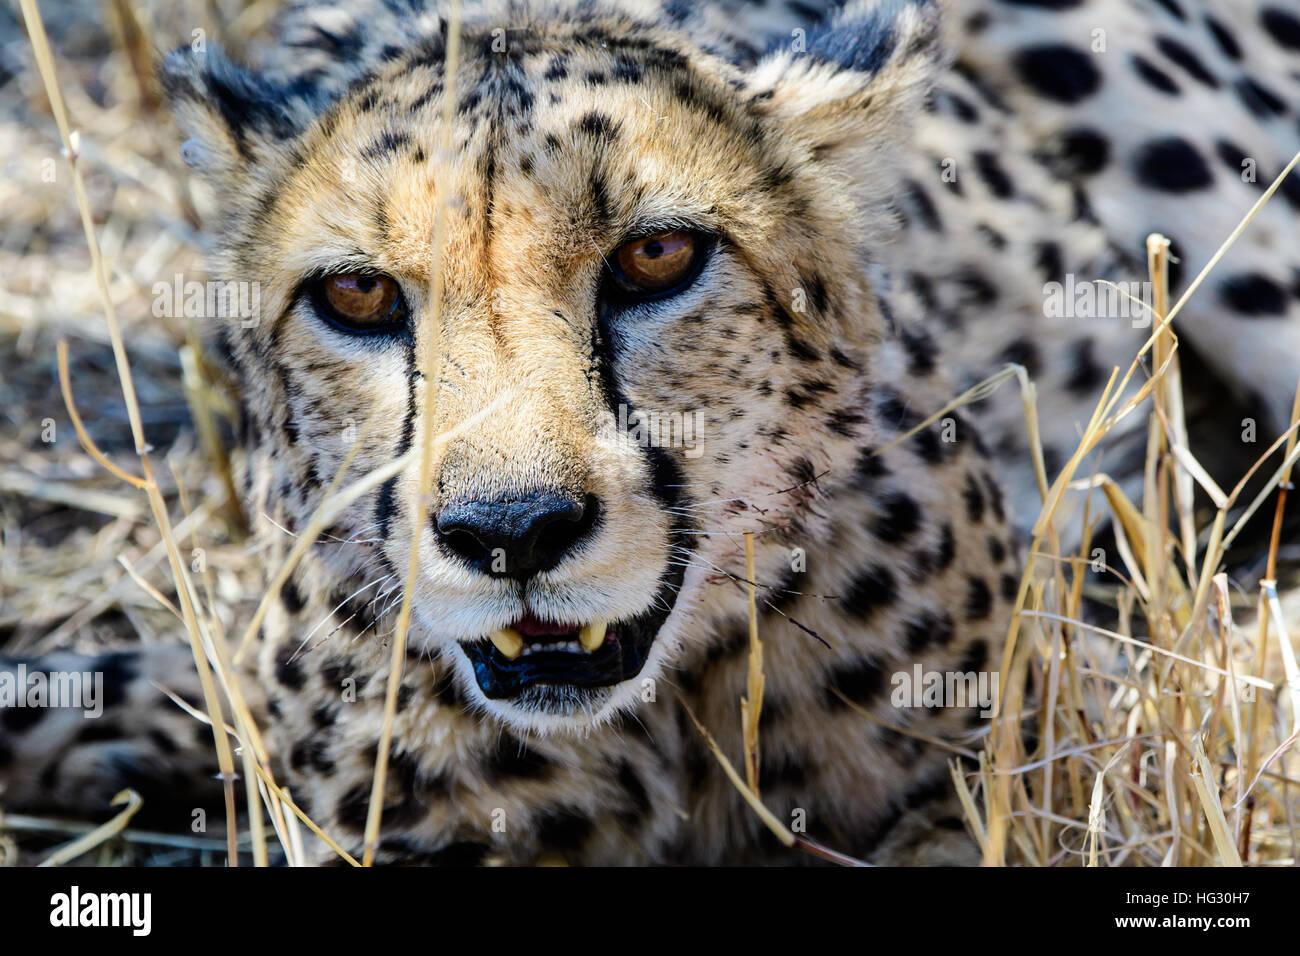 Piercing eyes of a Cheetah - Stock Image